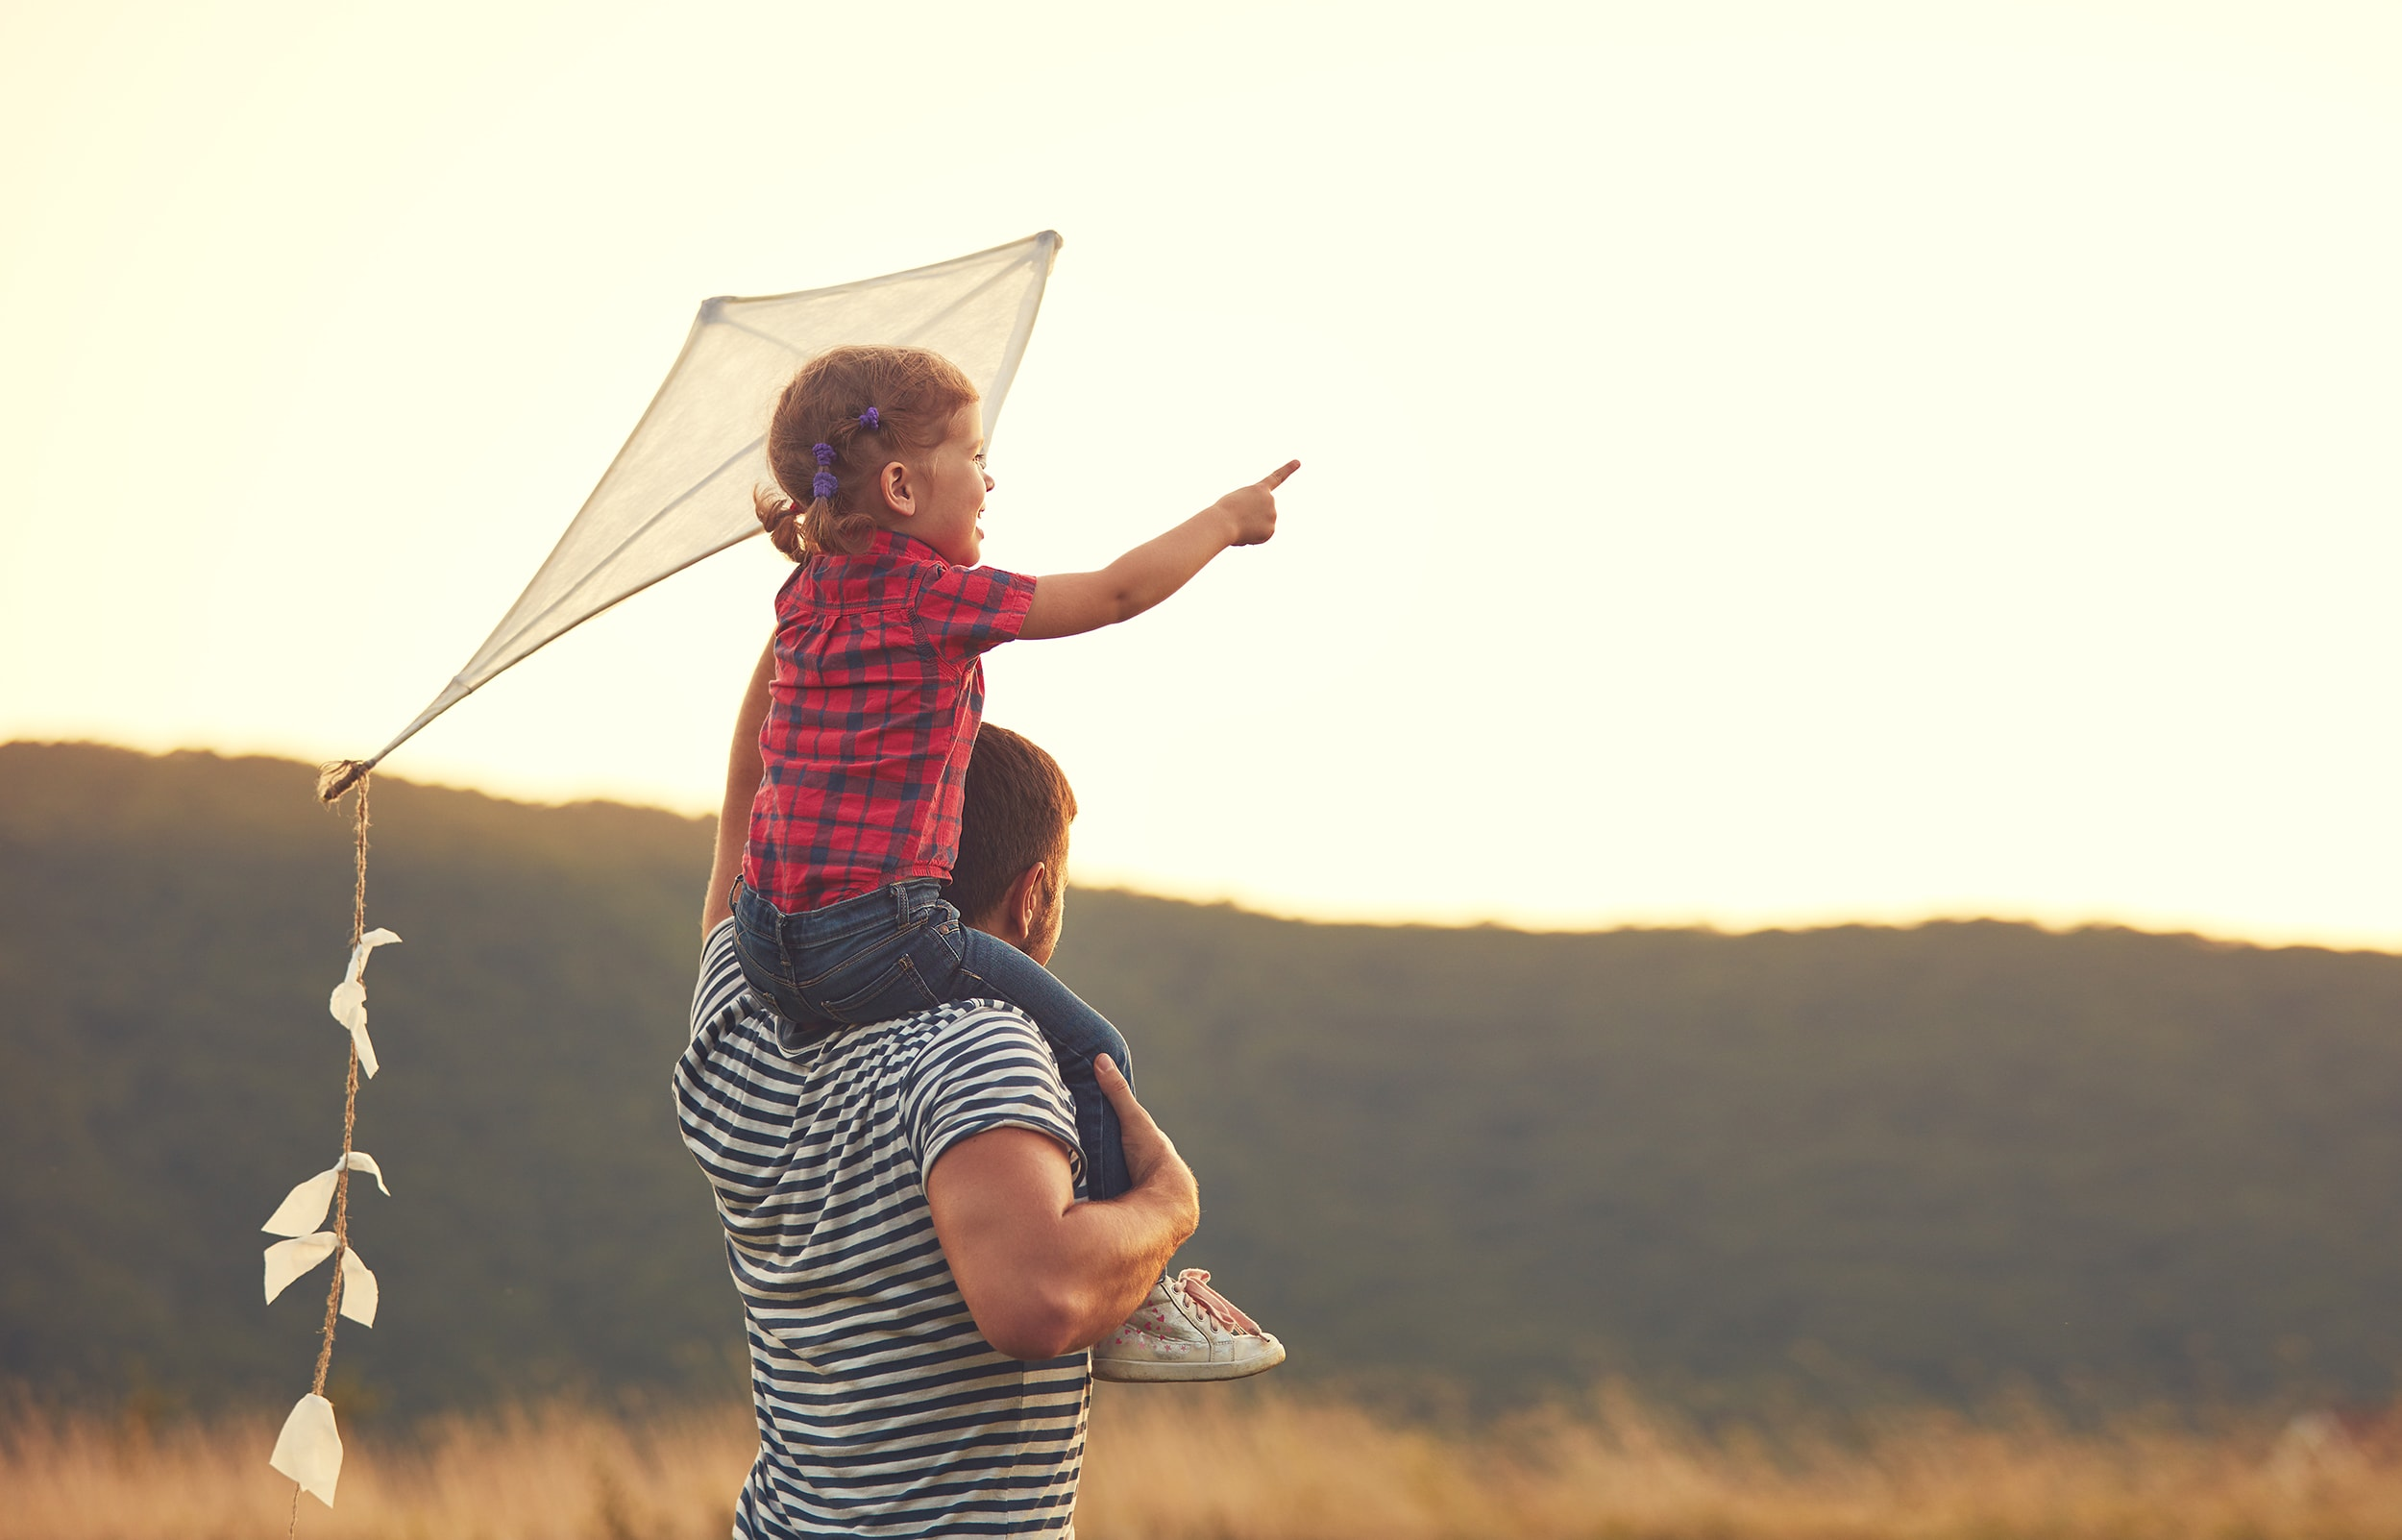 Child Holding Kite